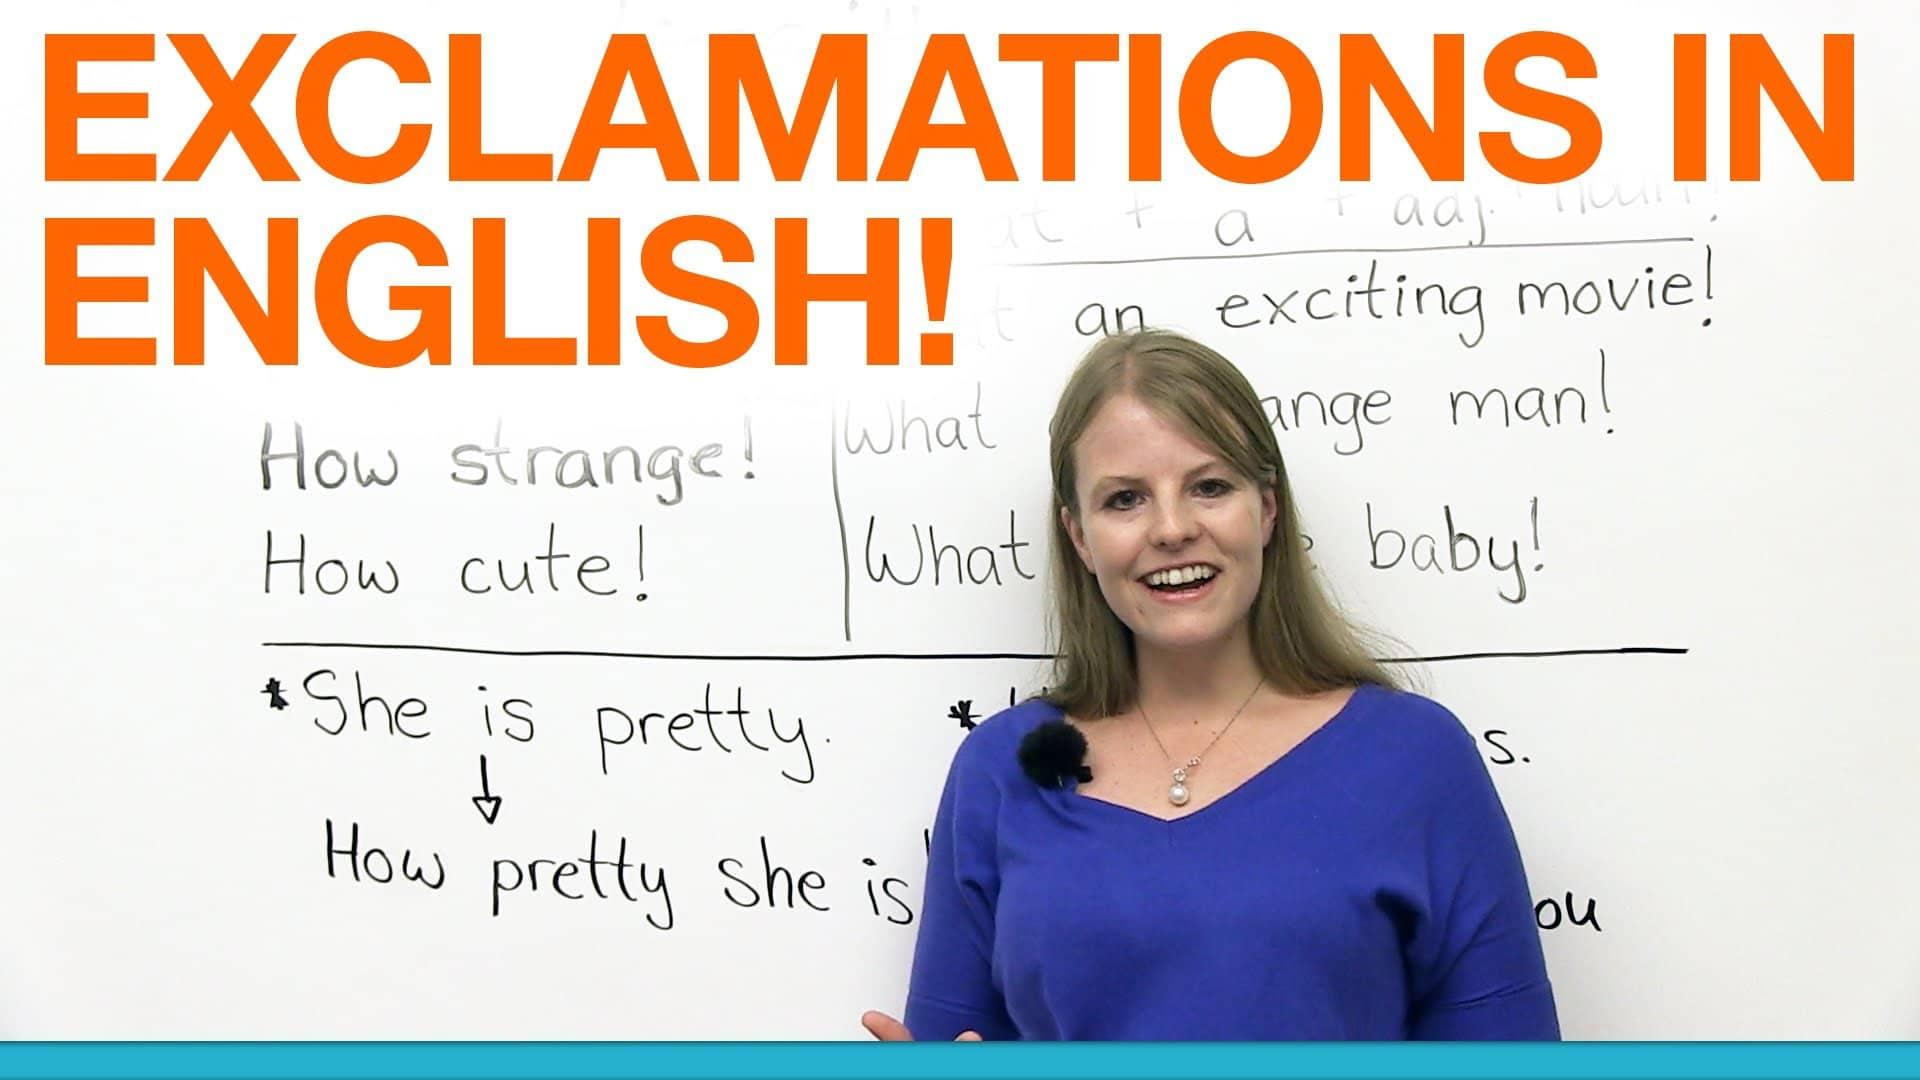 exclamation sentences